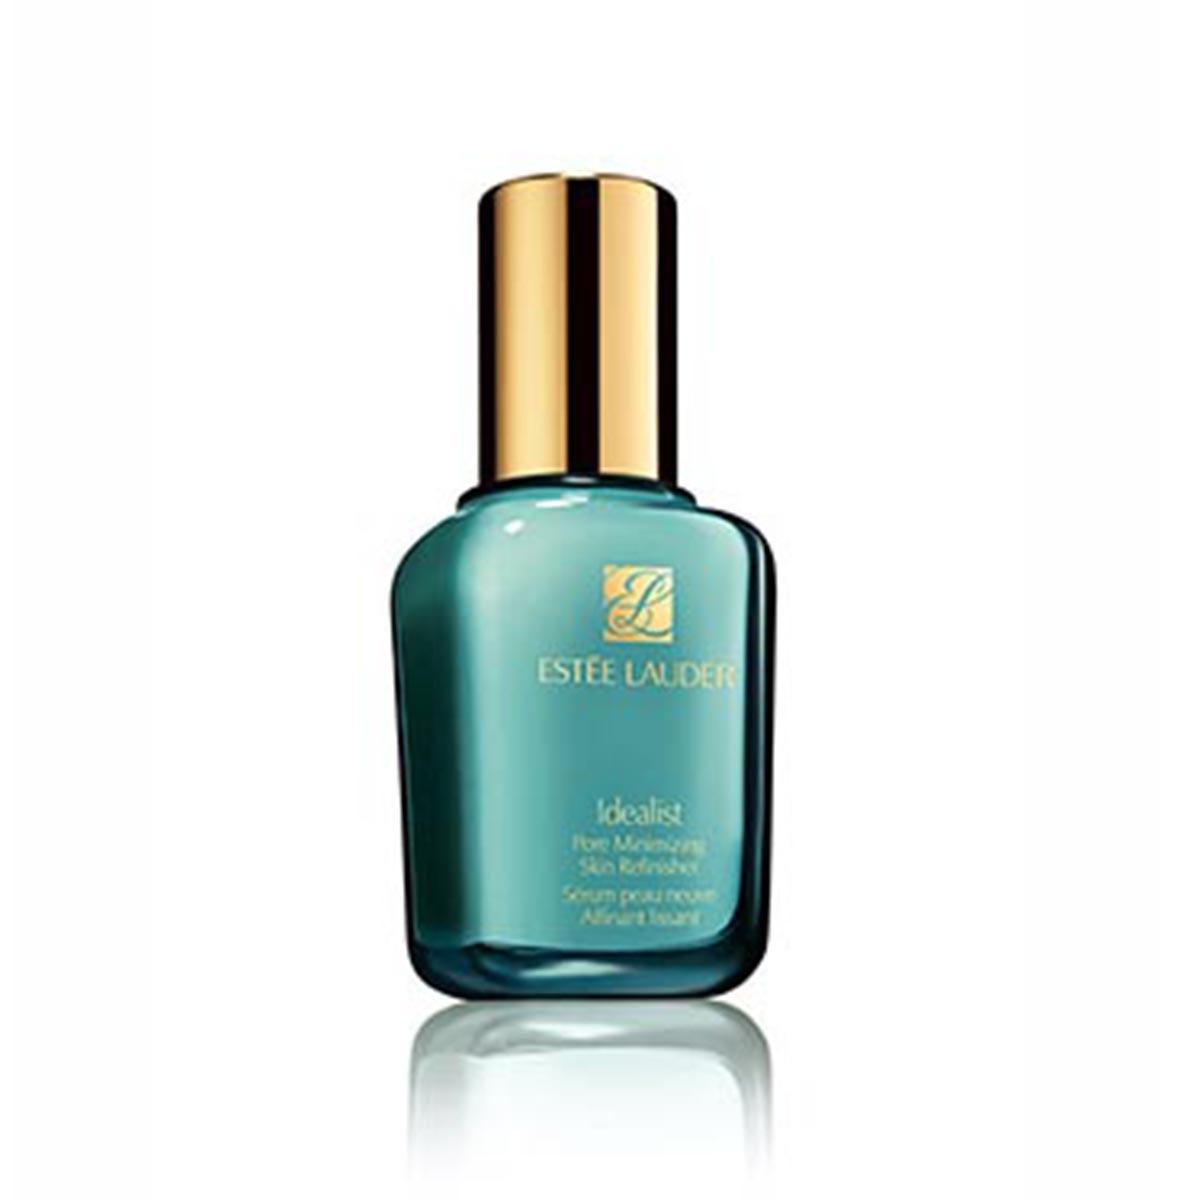 Estee lauder idealist pore minimizing skin refinisher serum 50ml